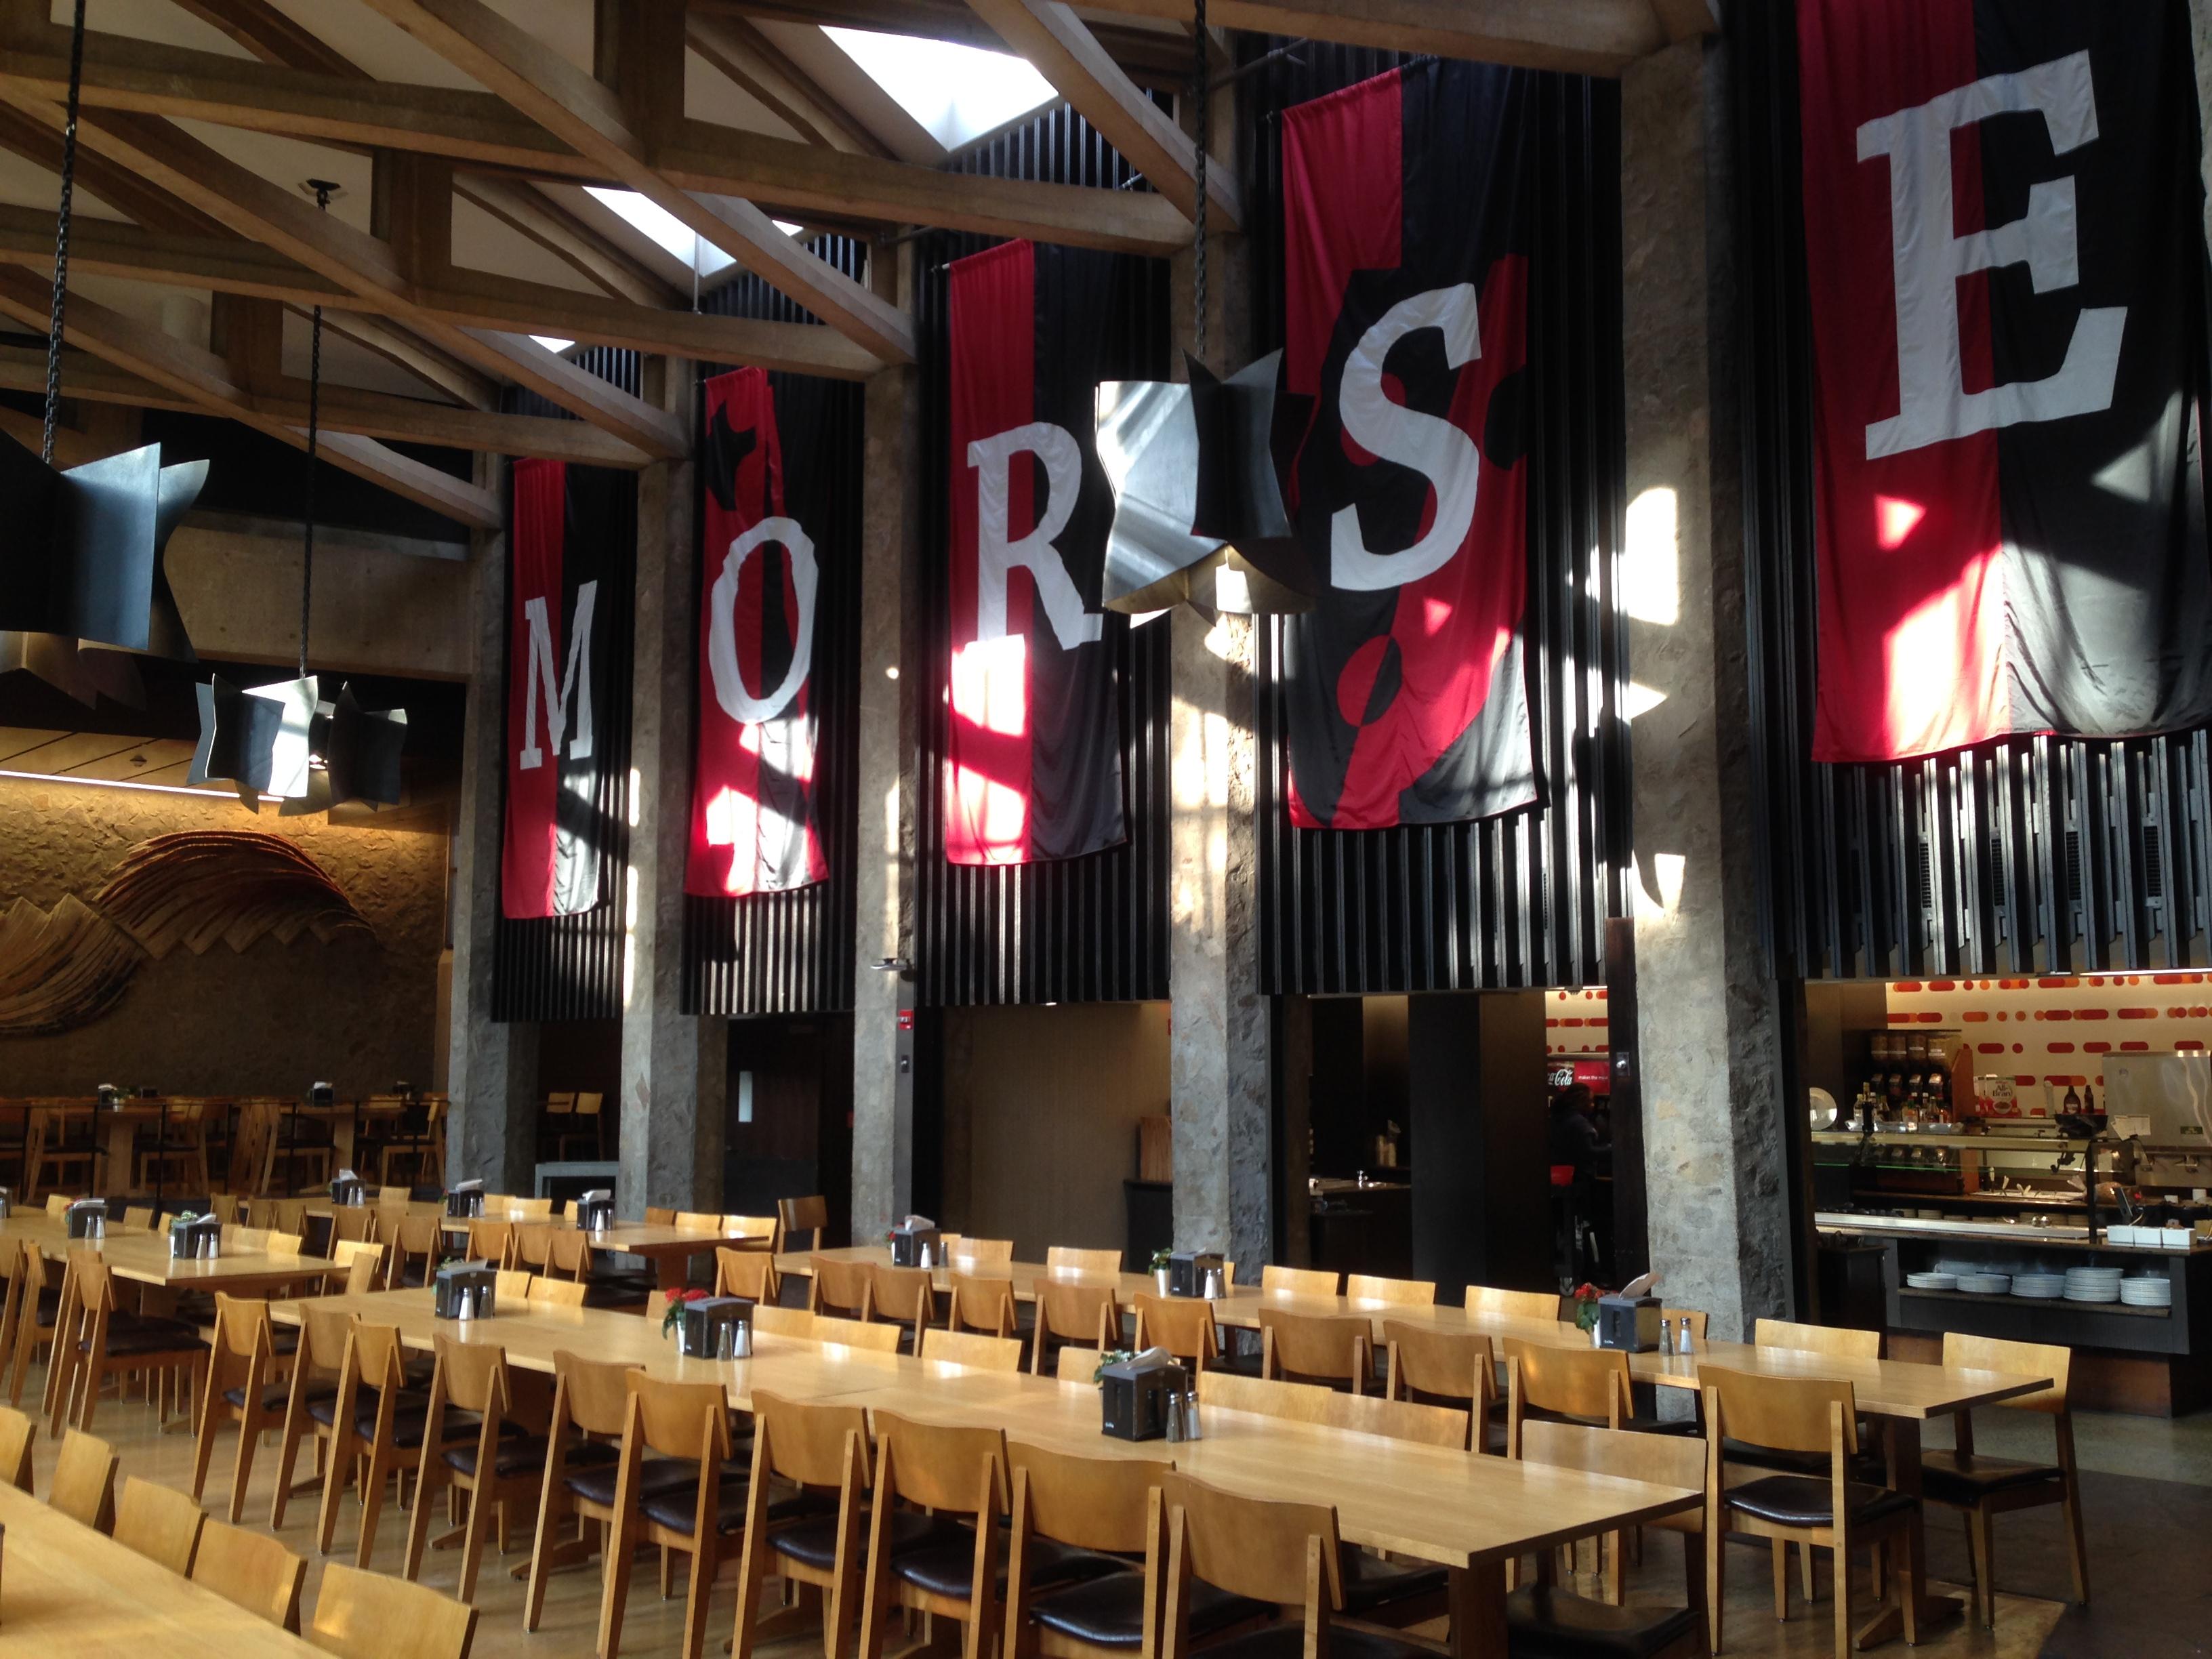 Morse dining hall